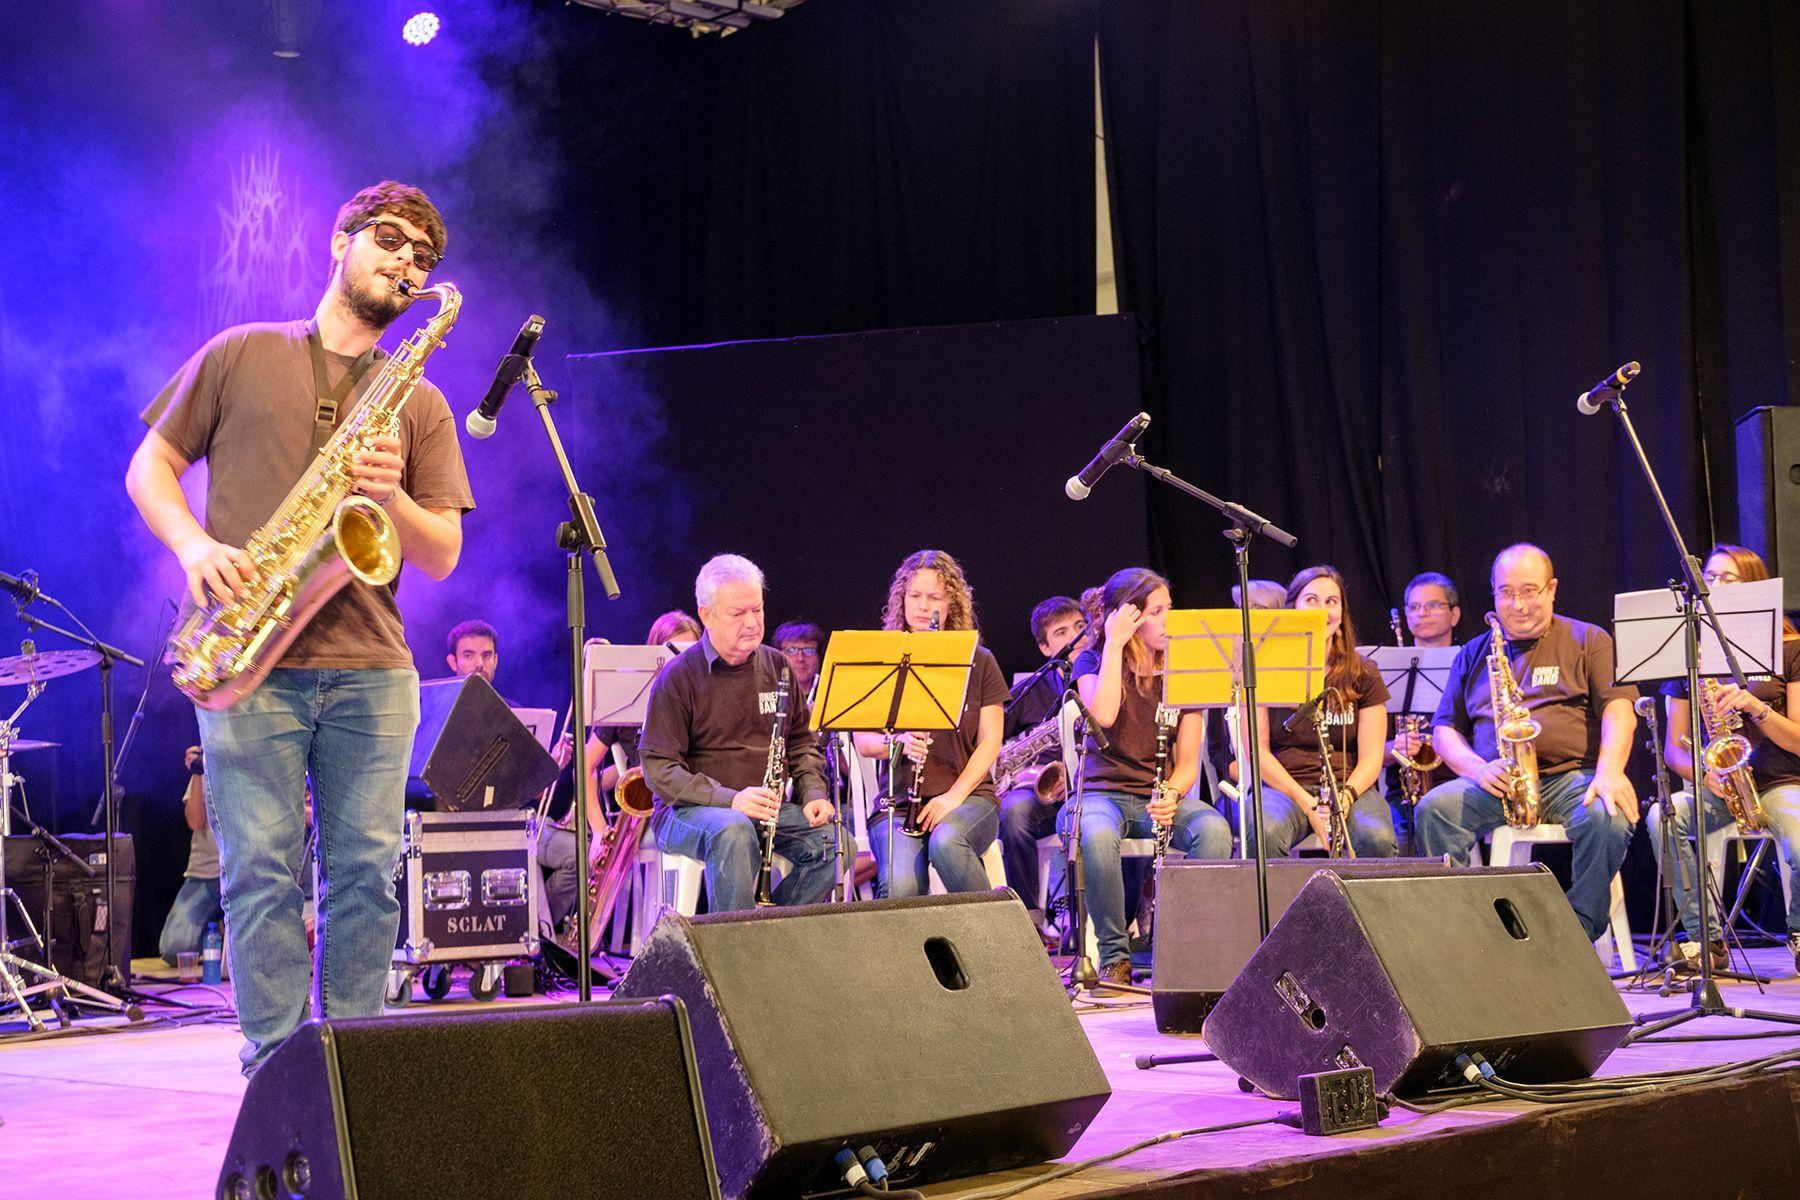 Actuació musical a la carpa de la plaça de Sant Ramon. FOTO: Ale Gómez